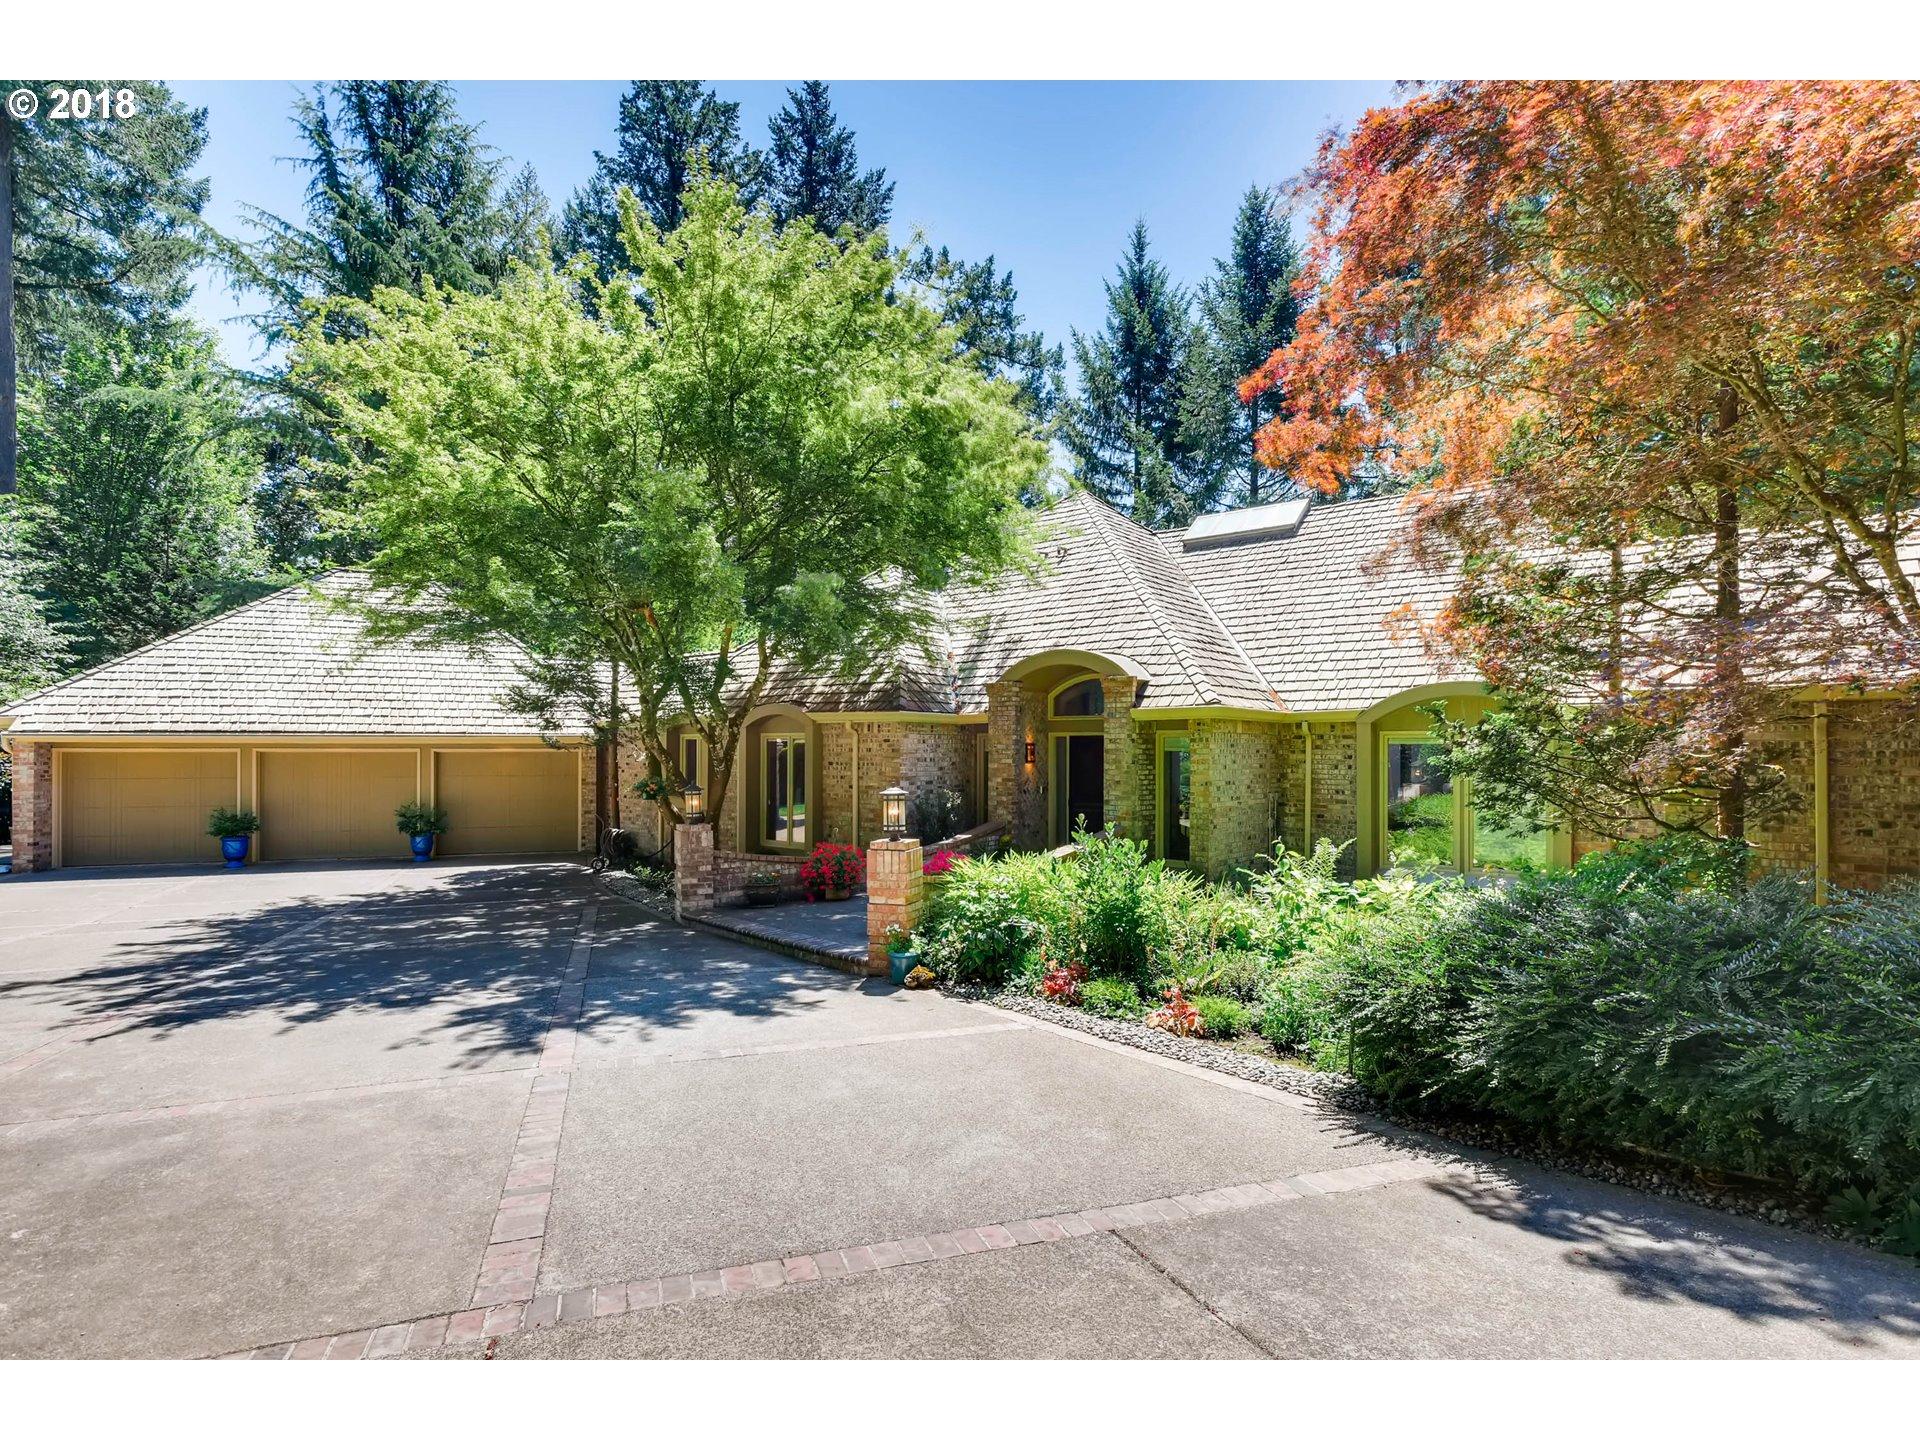 01730 SW CORBETT HILL CIR, Portland OR 97219